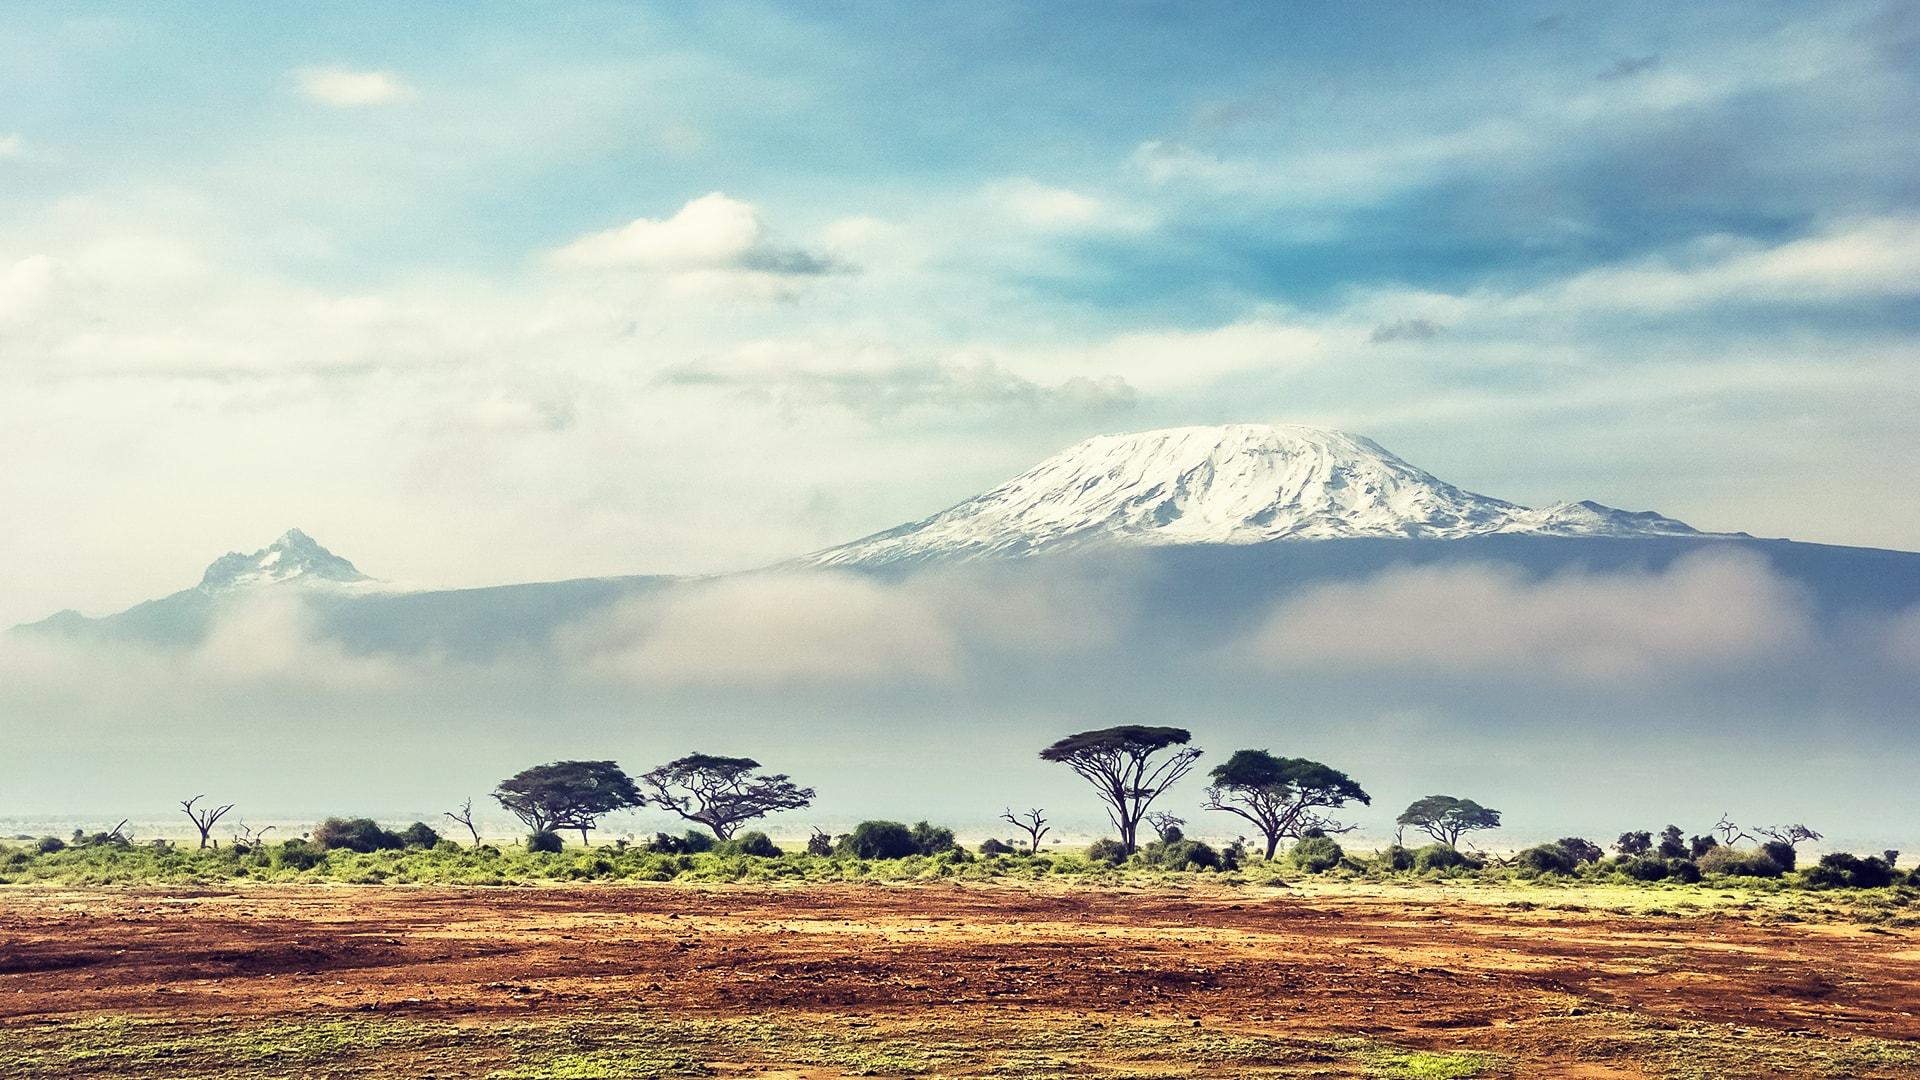 Viaje a medida por Tanzania